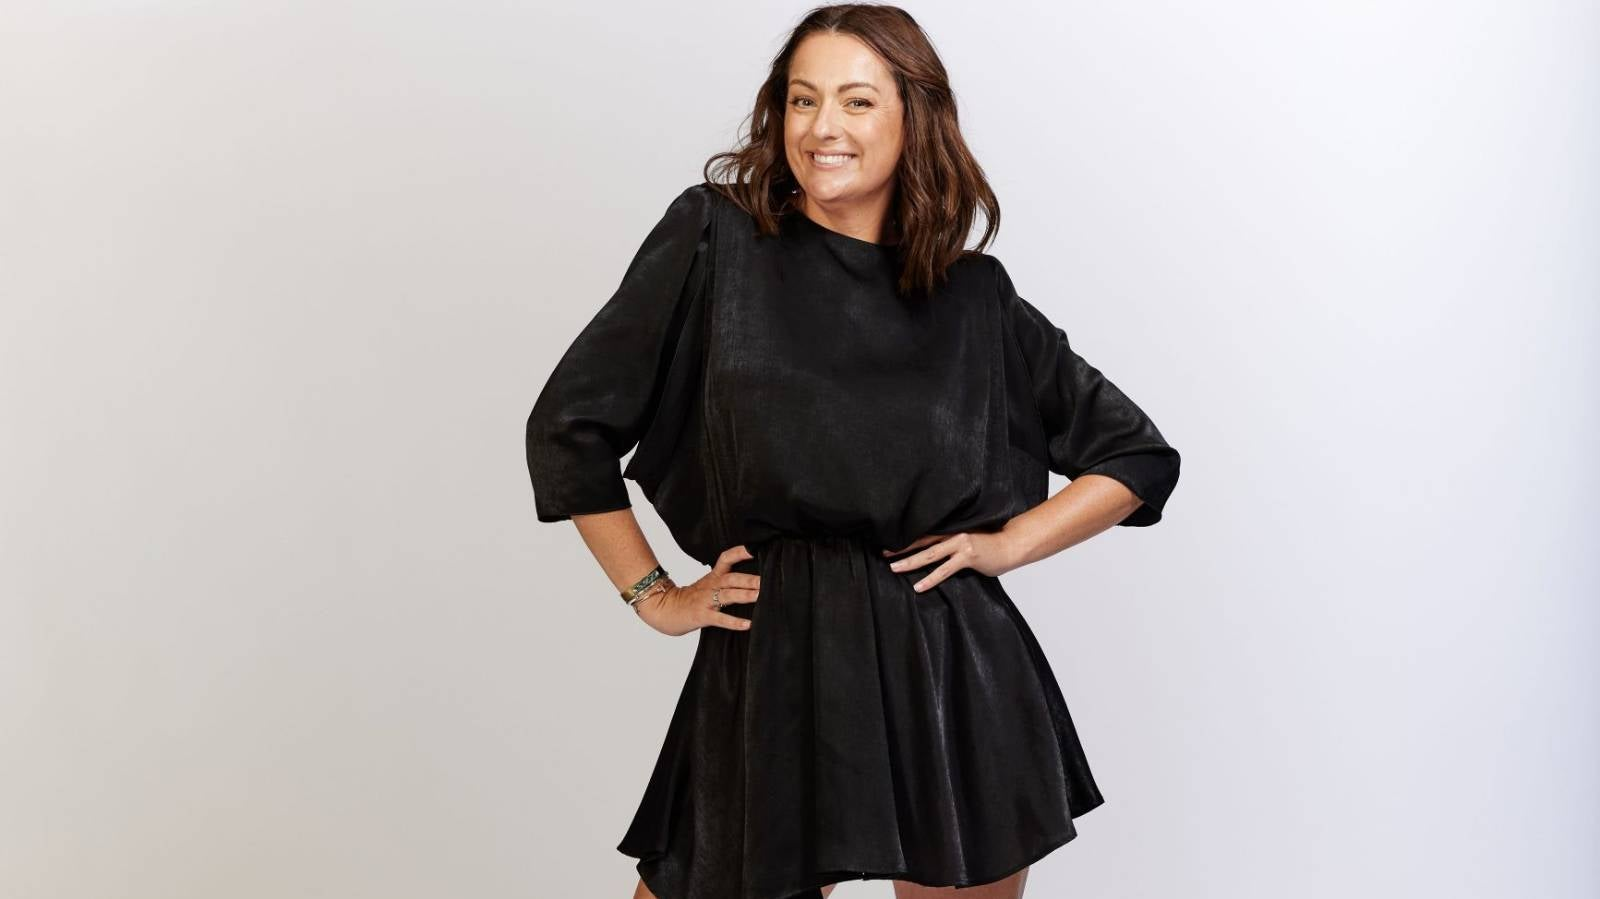 Comedian Celeste Barber heading to New Zealand in 2022